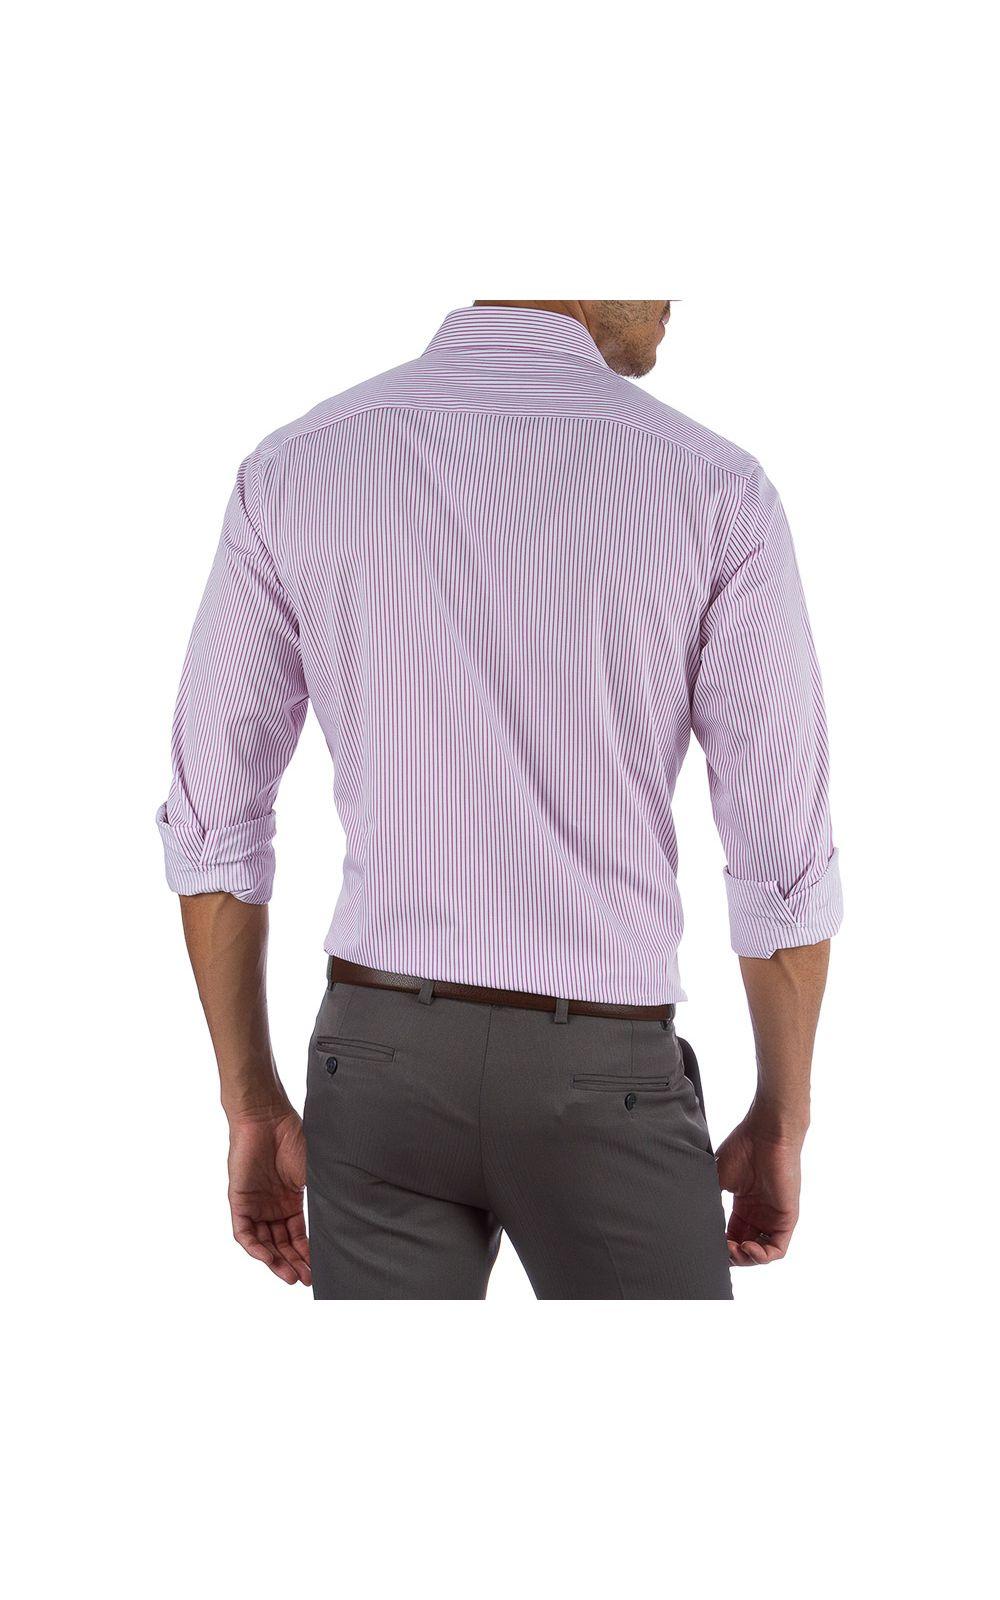 Foto 2 - Camisa Social Masculina Rosa Listrada